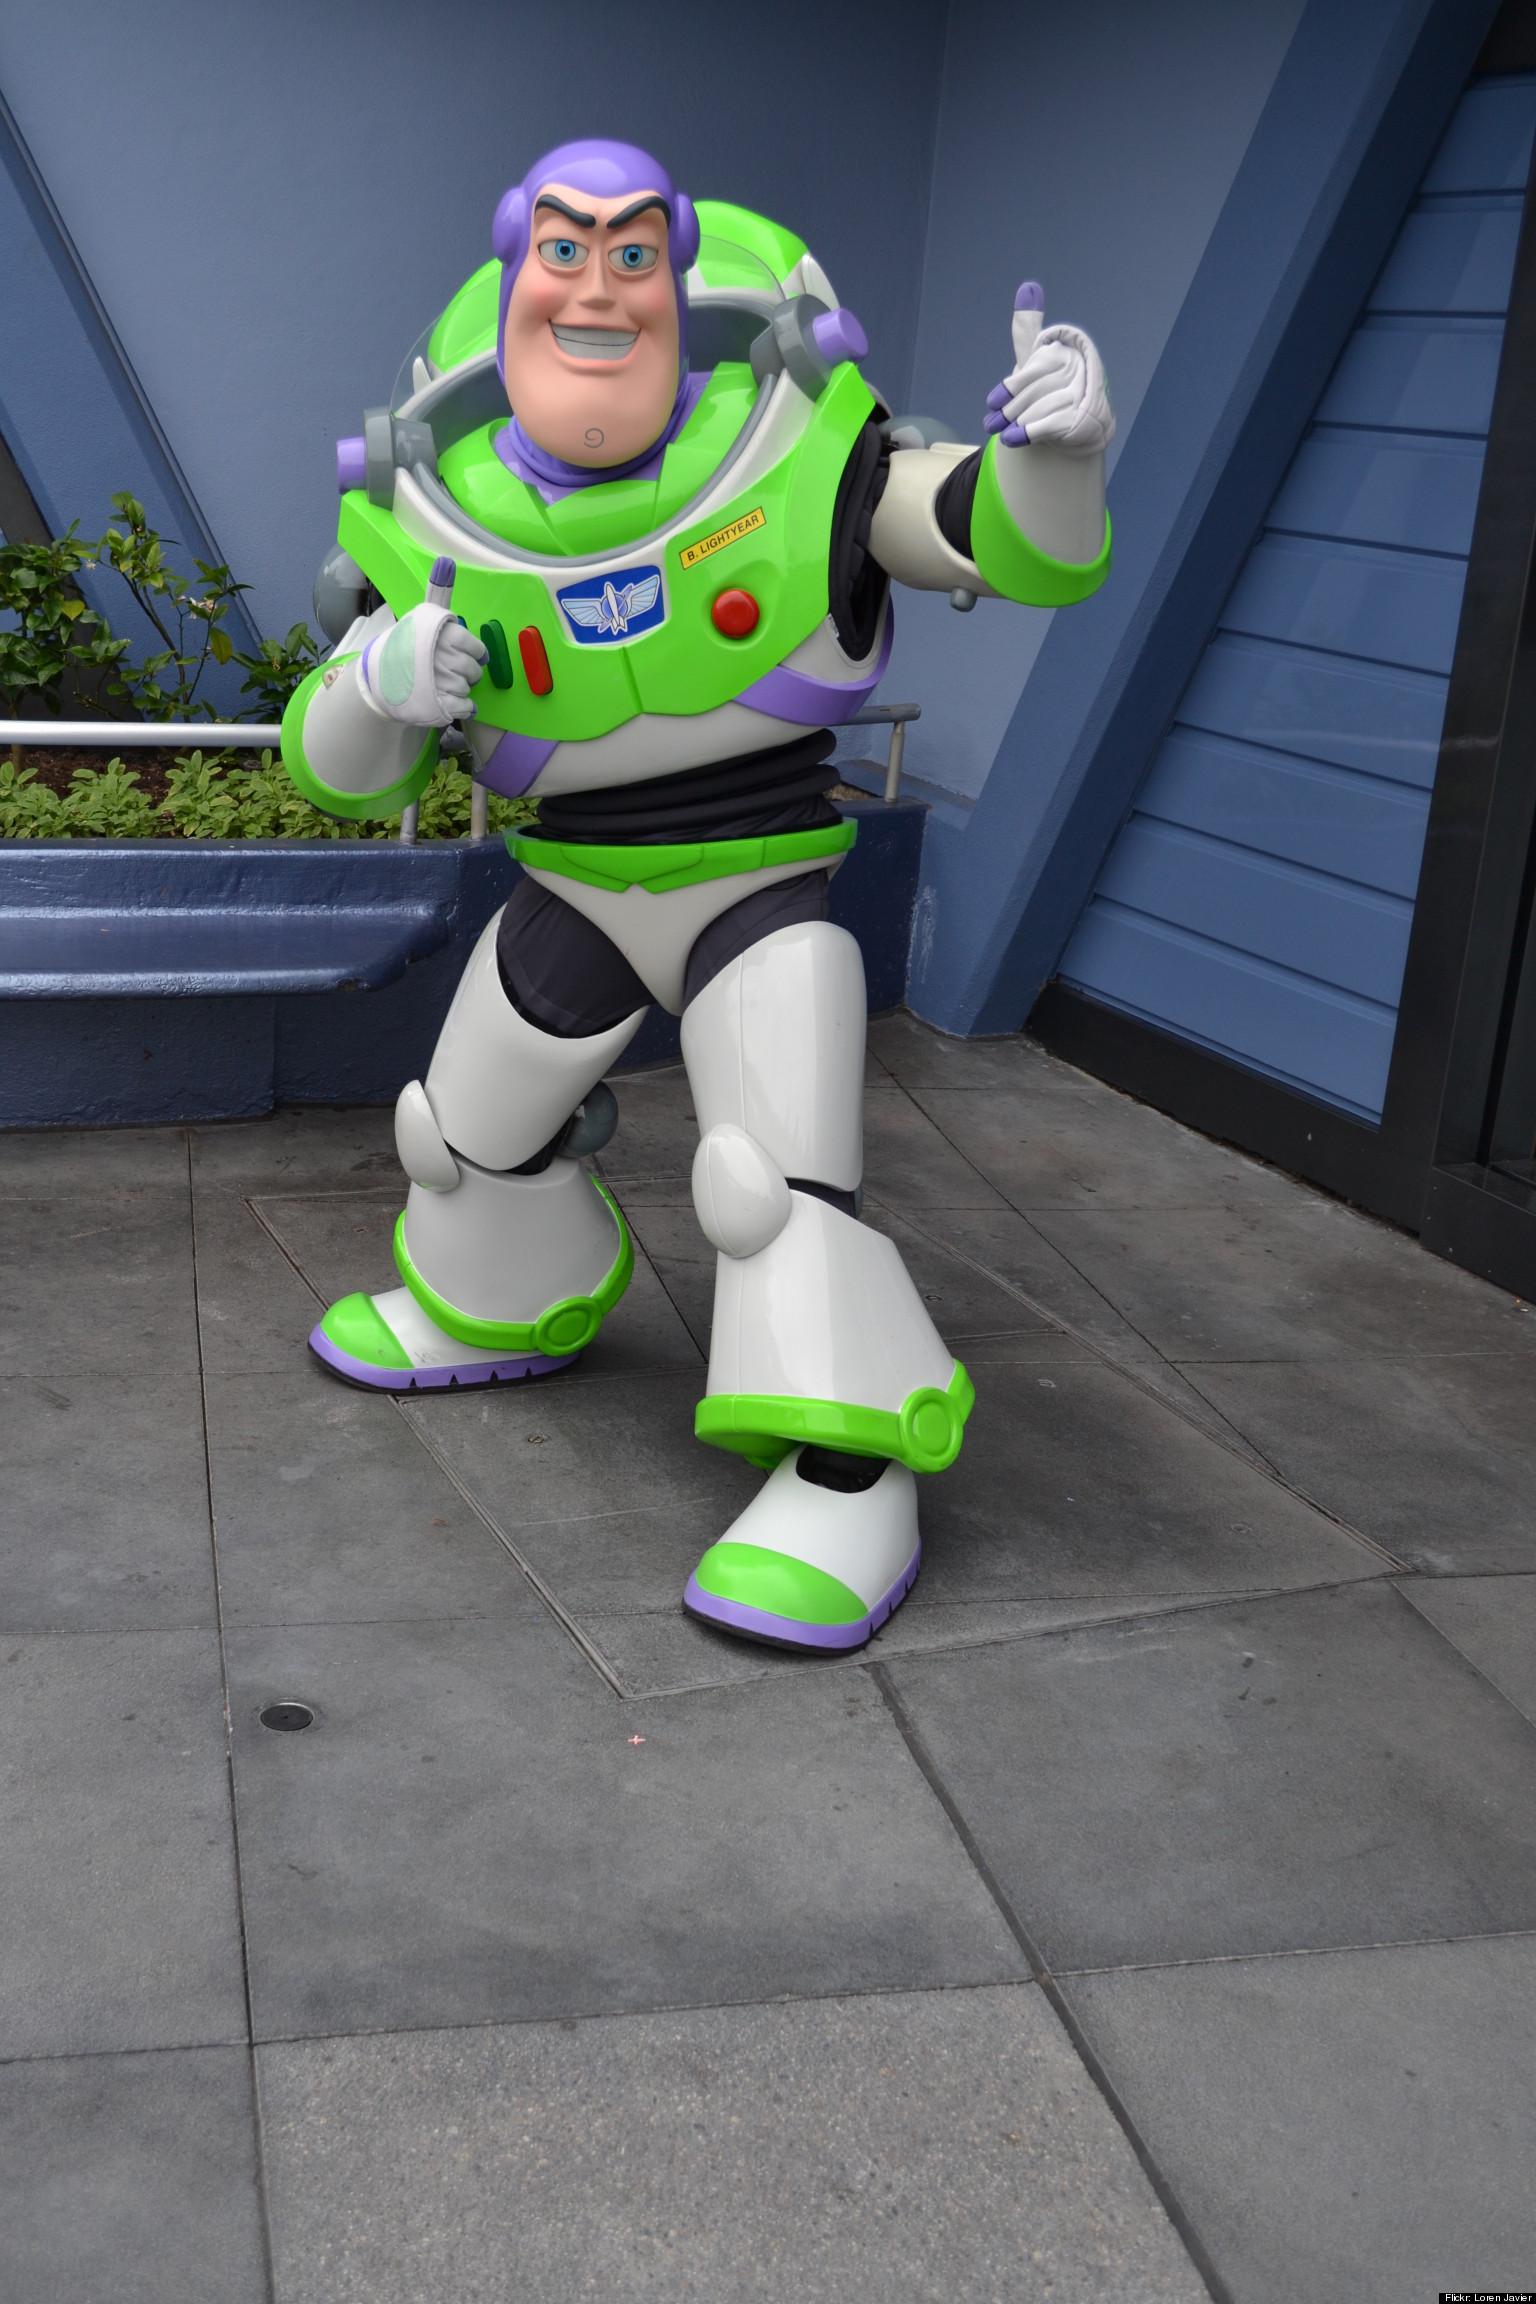 Nasa Z 1 Spacesuit Prototype Looks Like Buzz Lightyear S